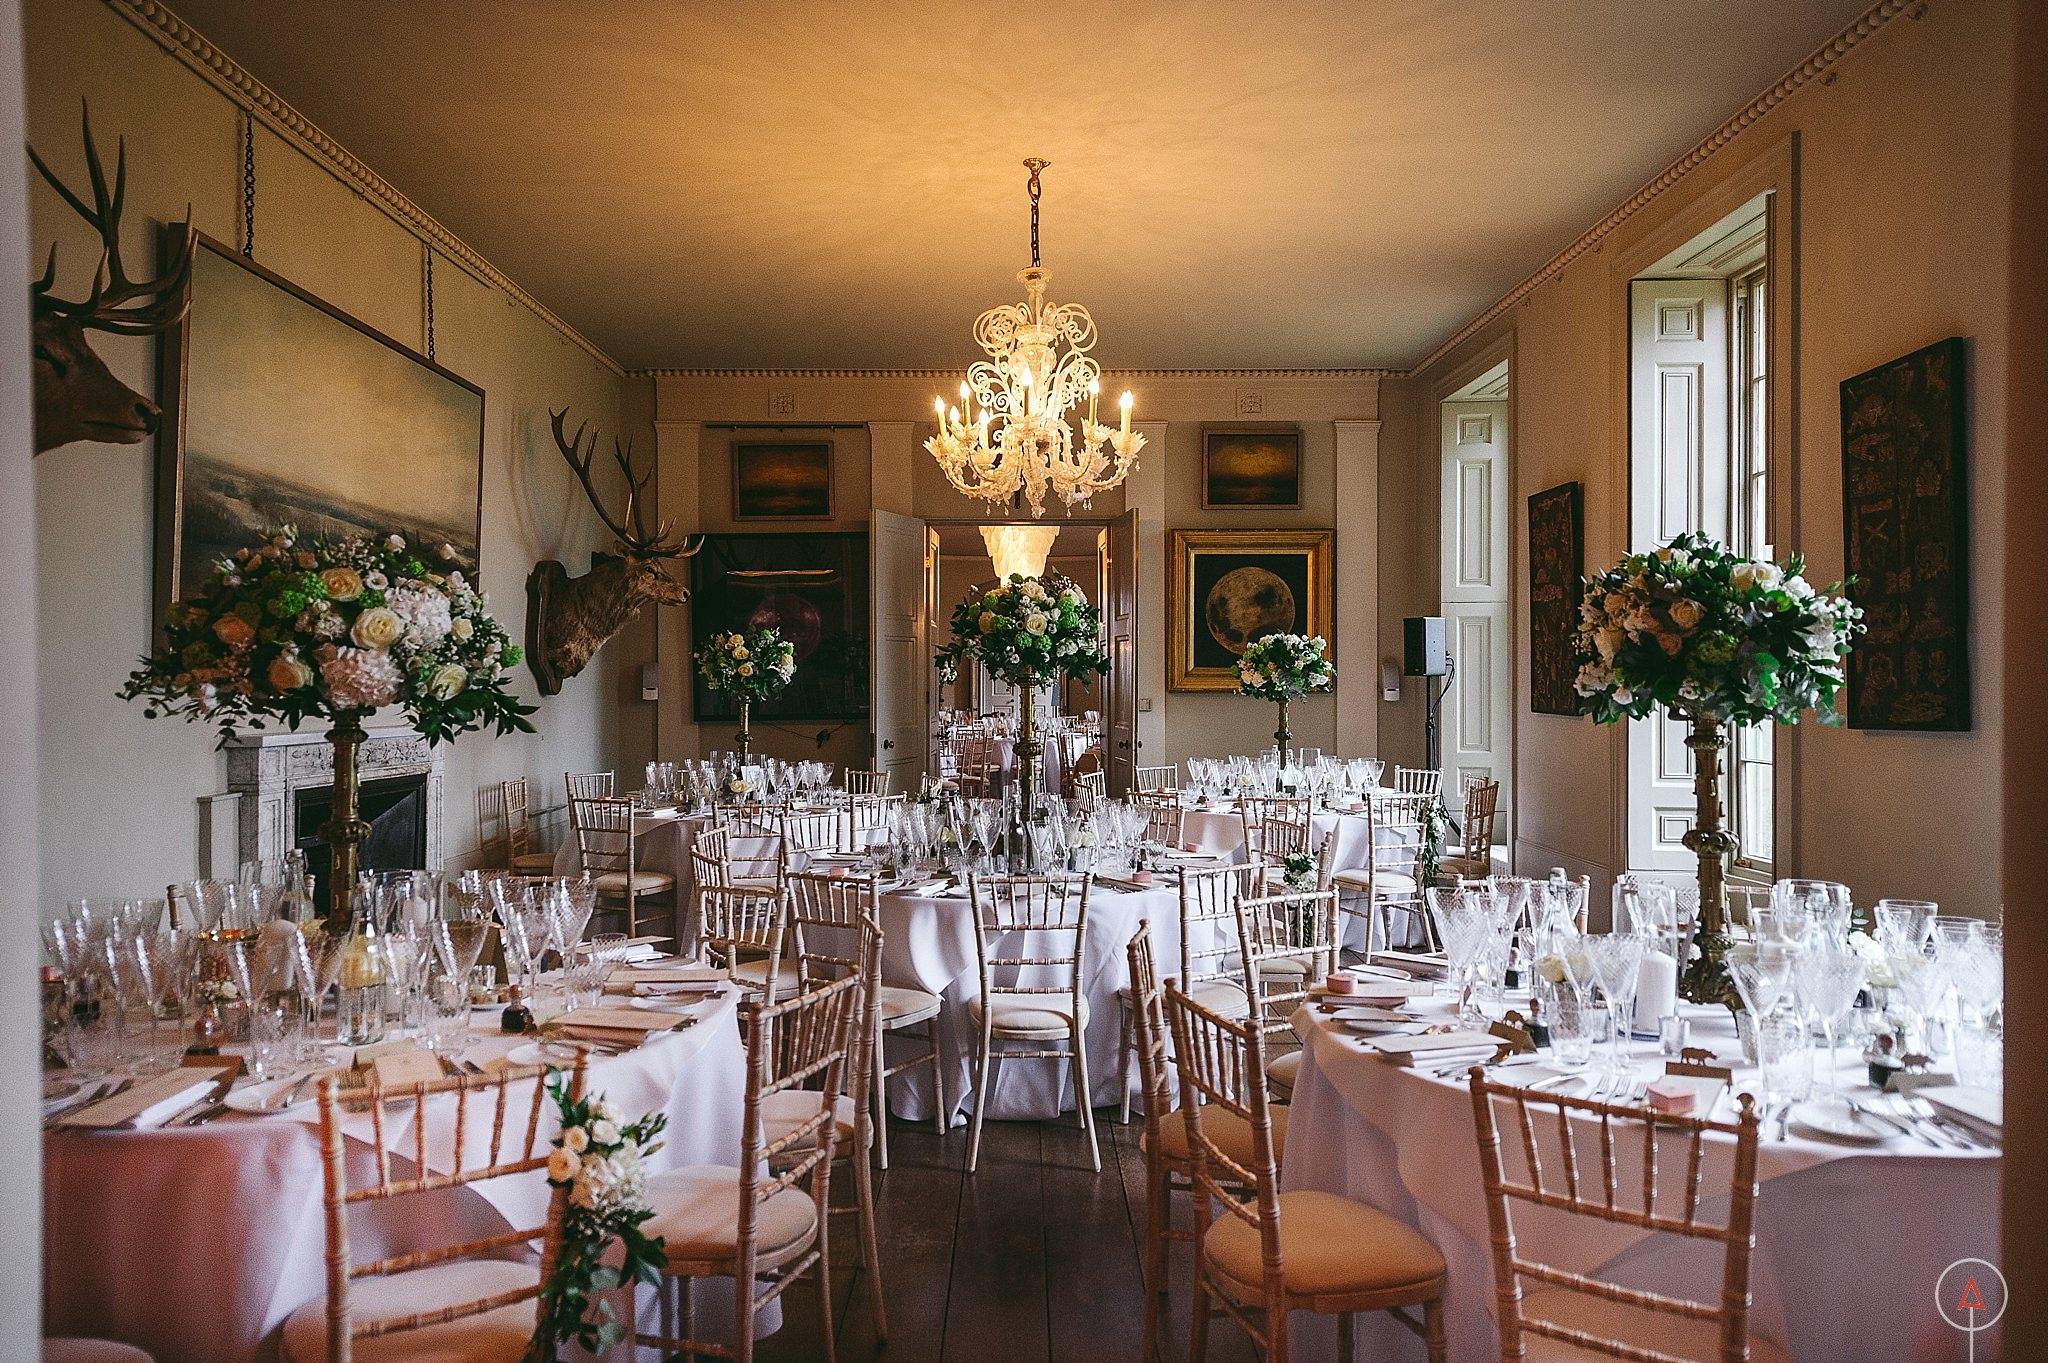 cardiff-wedding-photographer-aga-tomaszek_0285